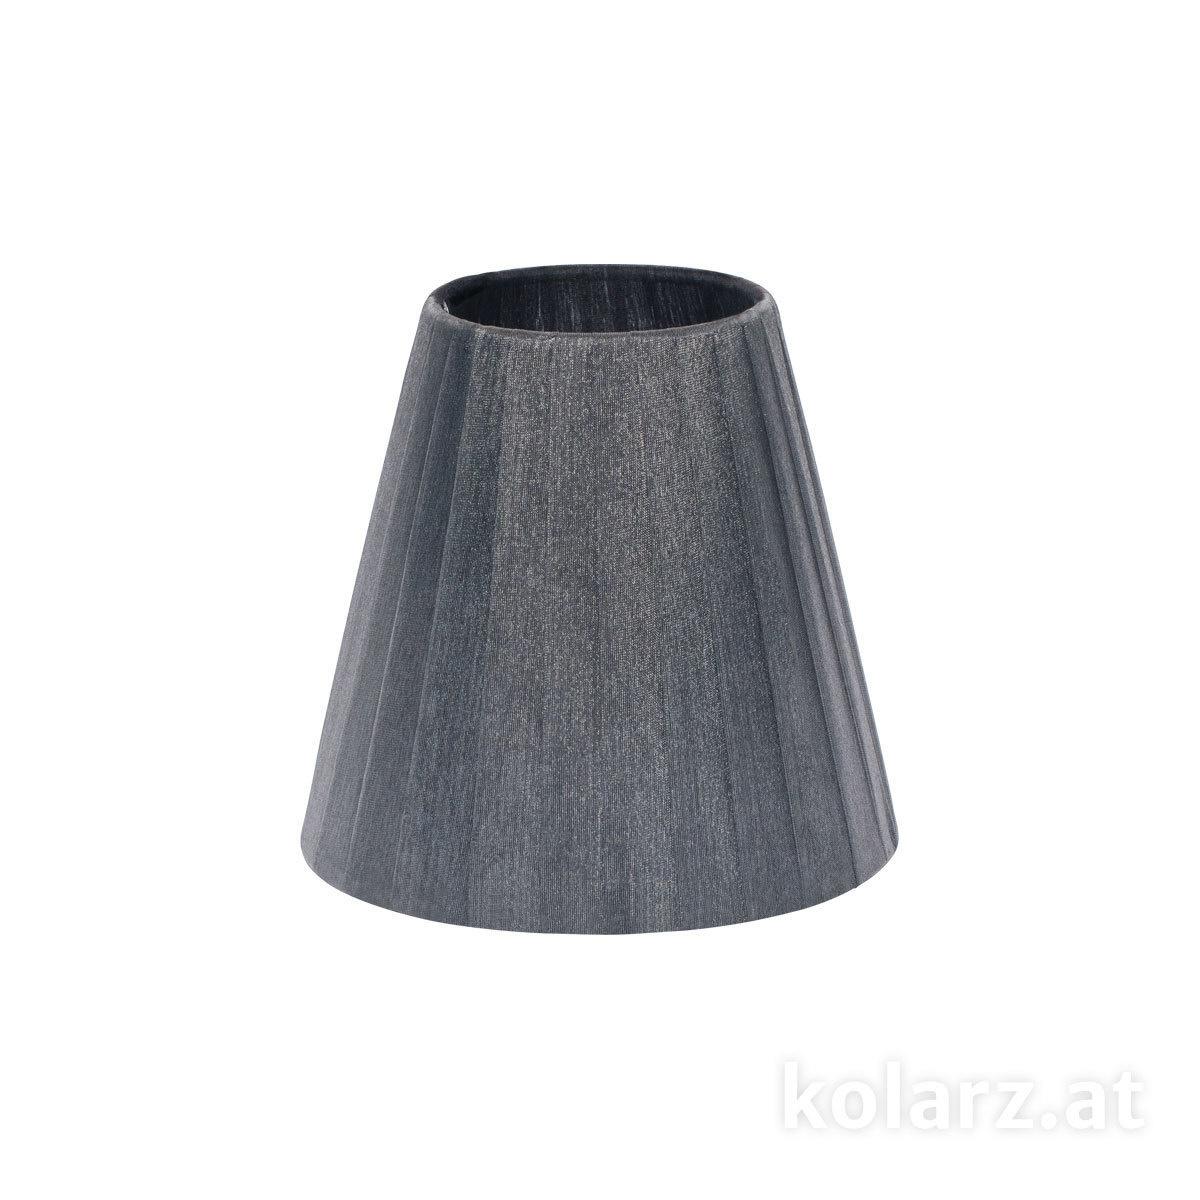 Lampshade shade organza organza grey 14cm height 13cm e14 5000 e14 s01 or gr f1g aloadofball Choice Image